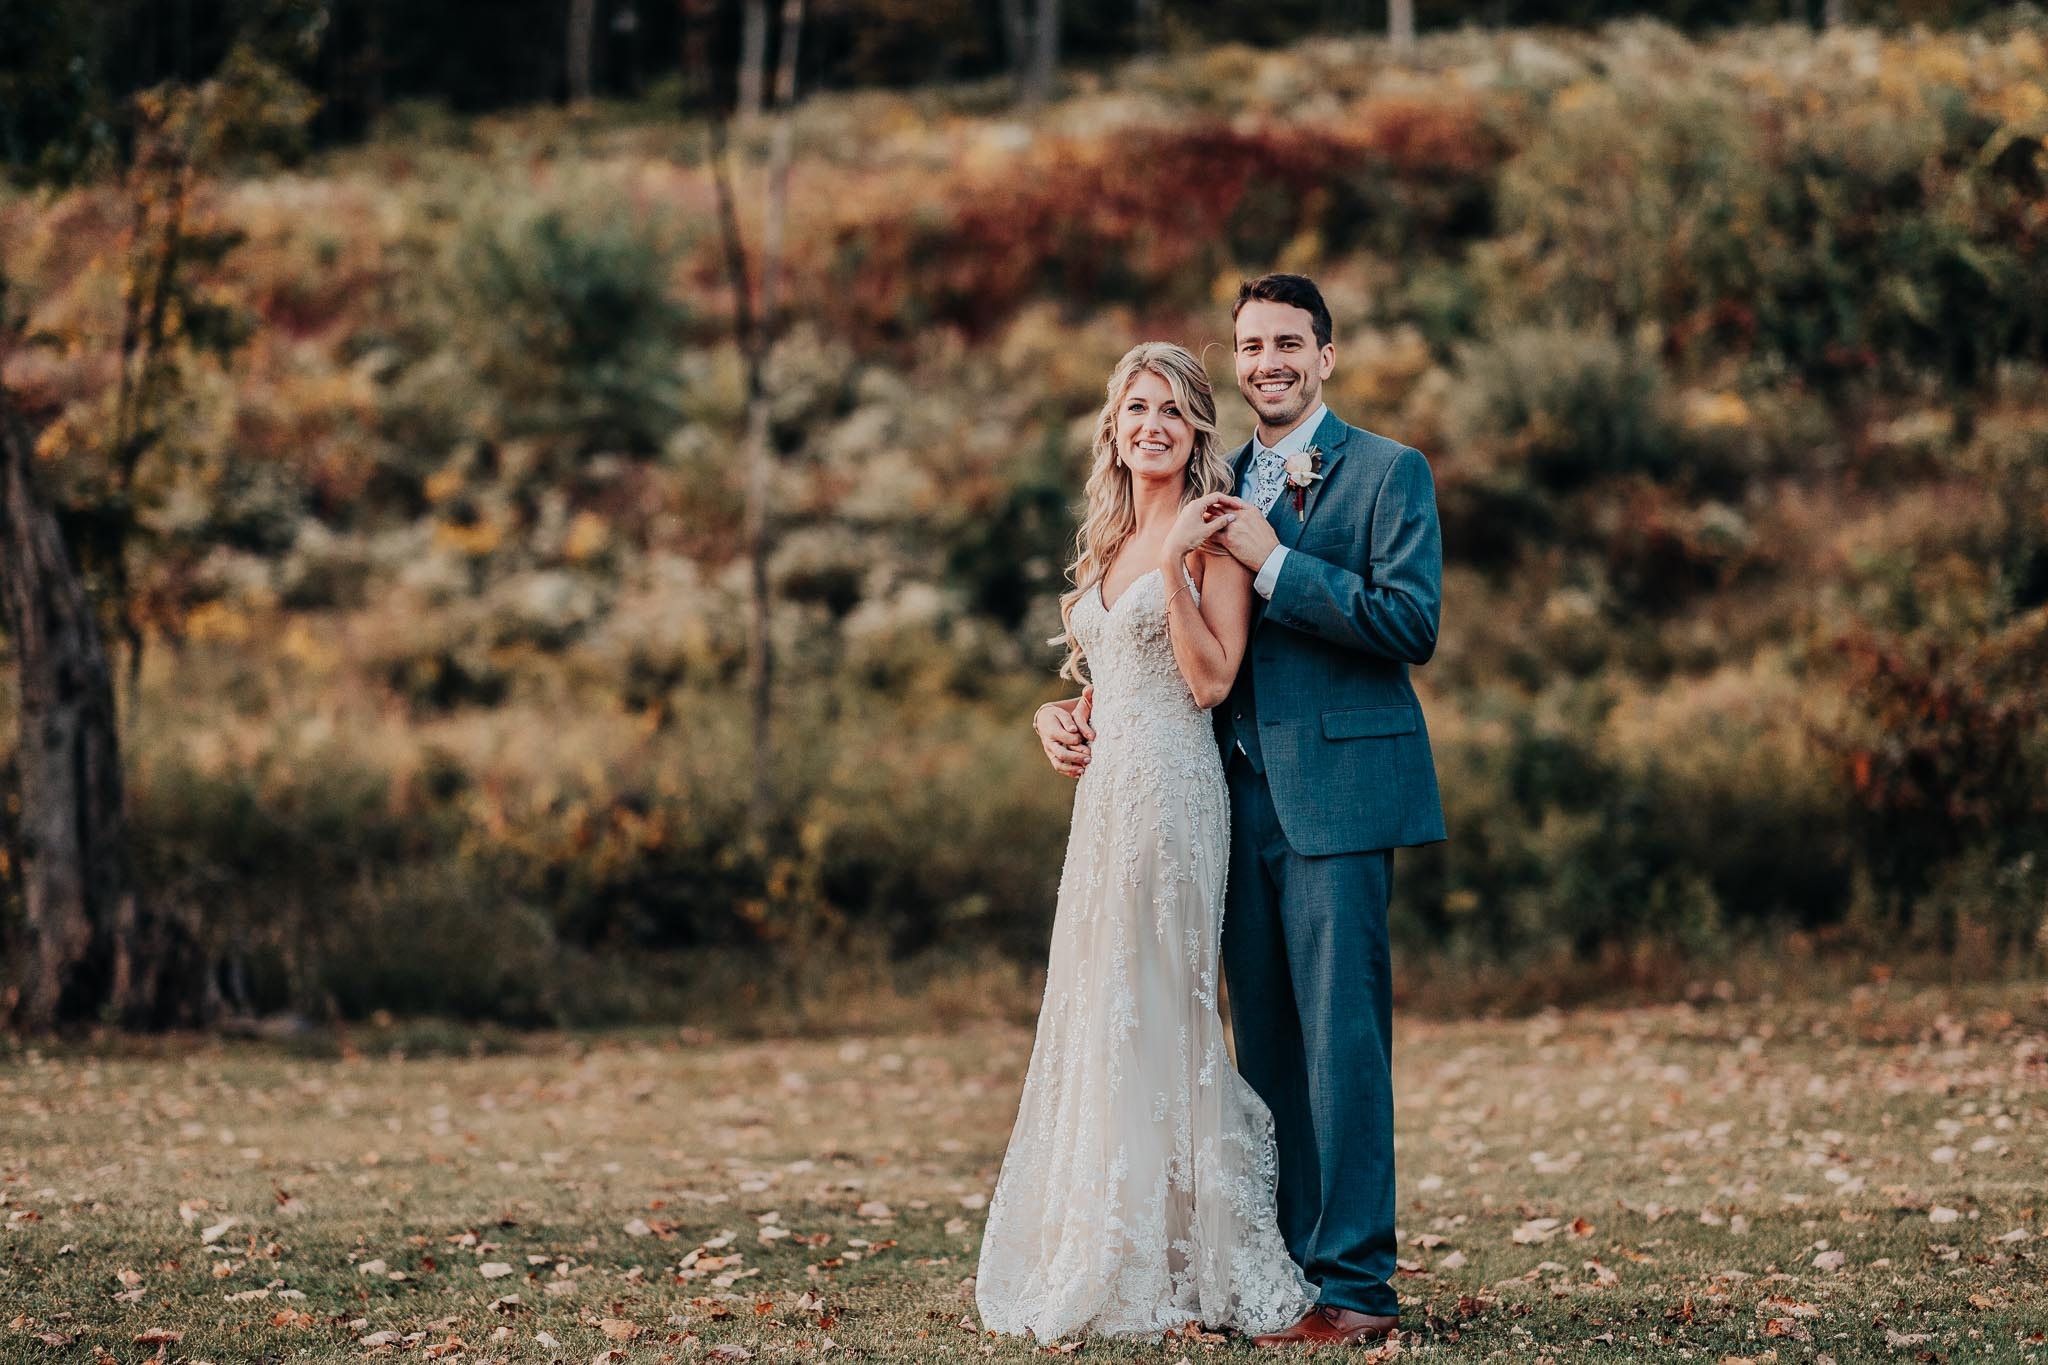 Frosty-Valley-September-Wedding-8446.jpg